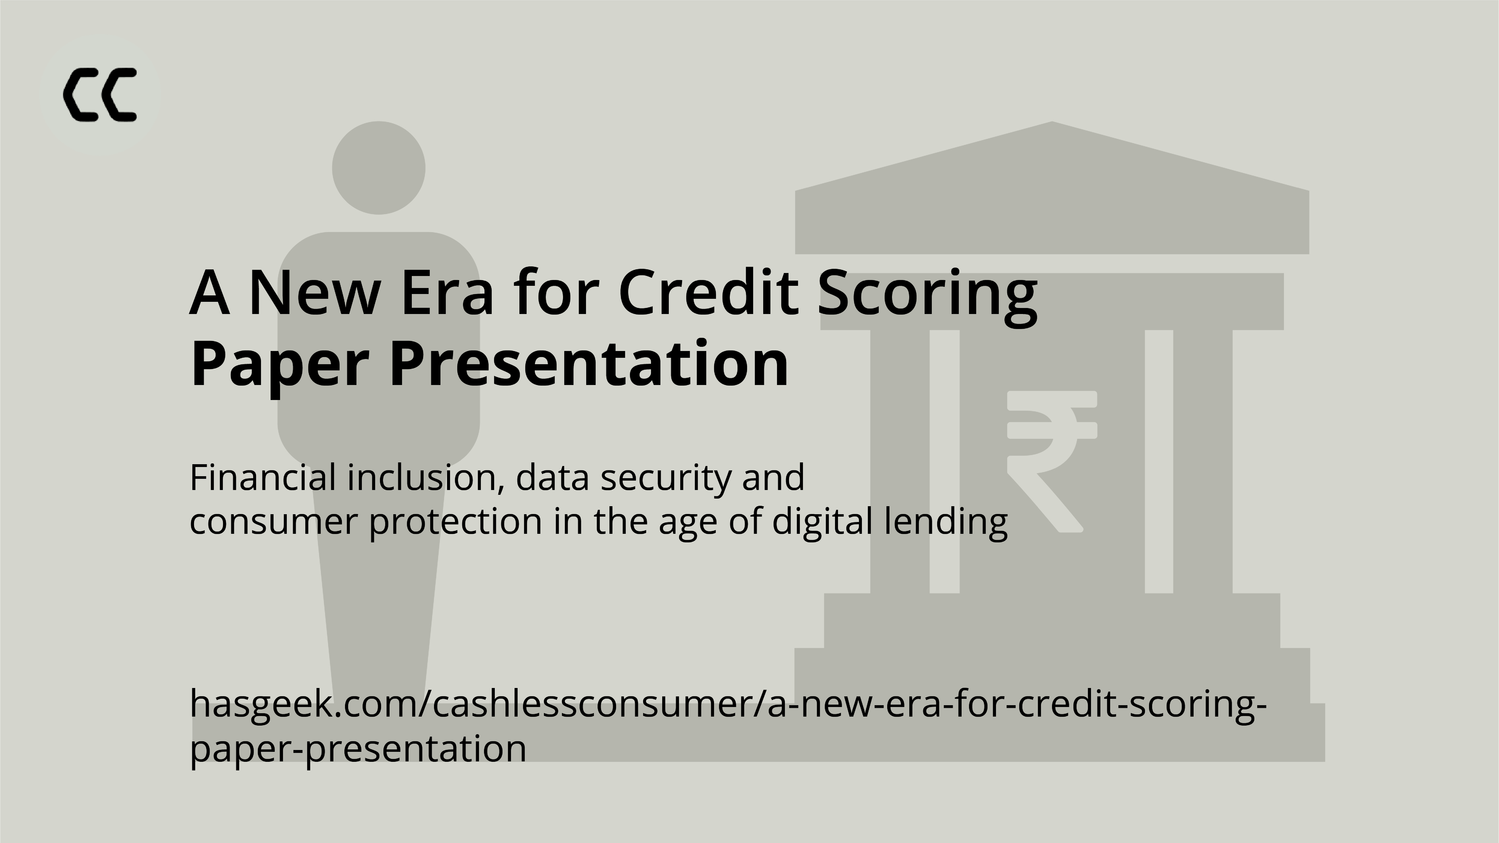 A New Era for Credit Scoring - Paper Presentation